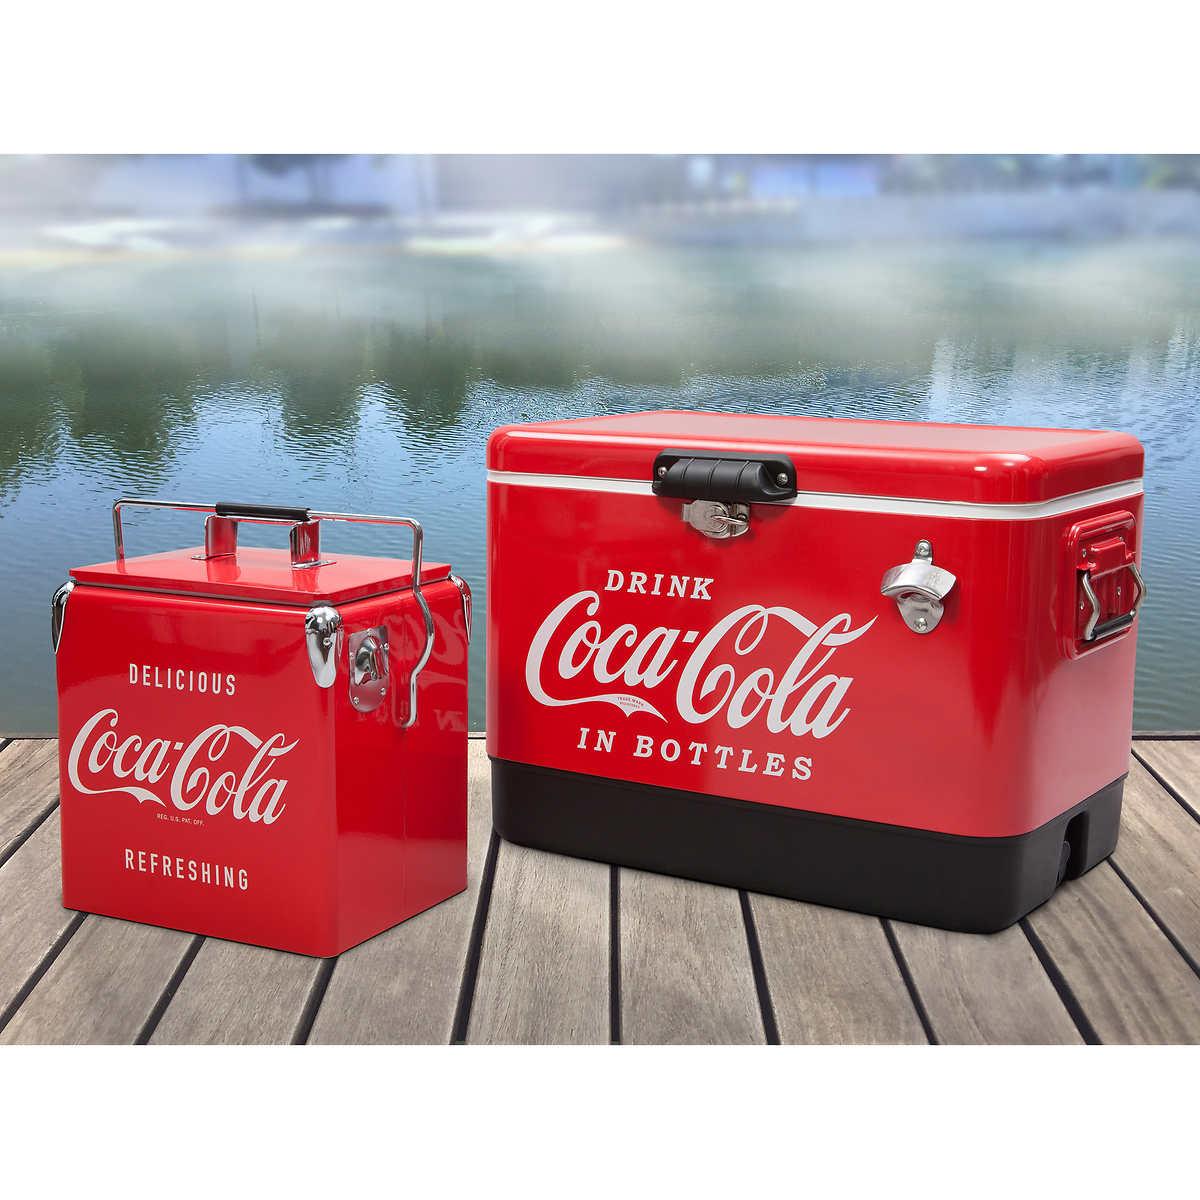 COCA COLA BOTTLE DESIGN VINTAGE RETRO COKE WINE COOLER JACKET